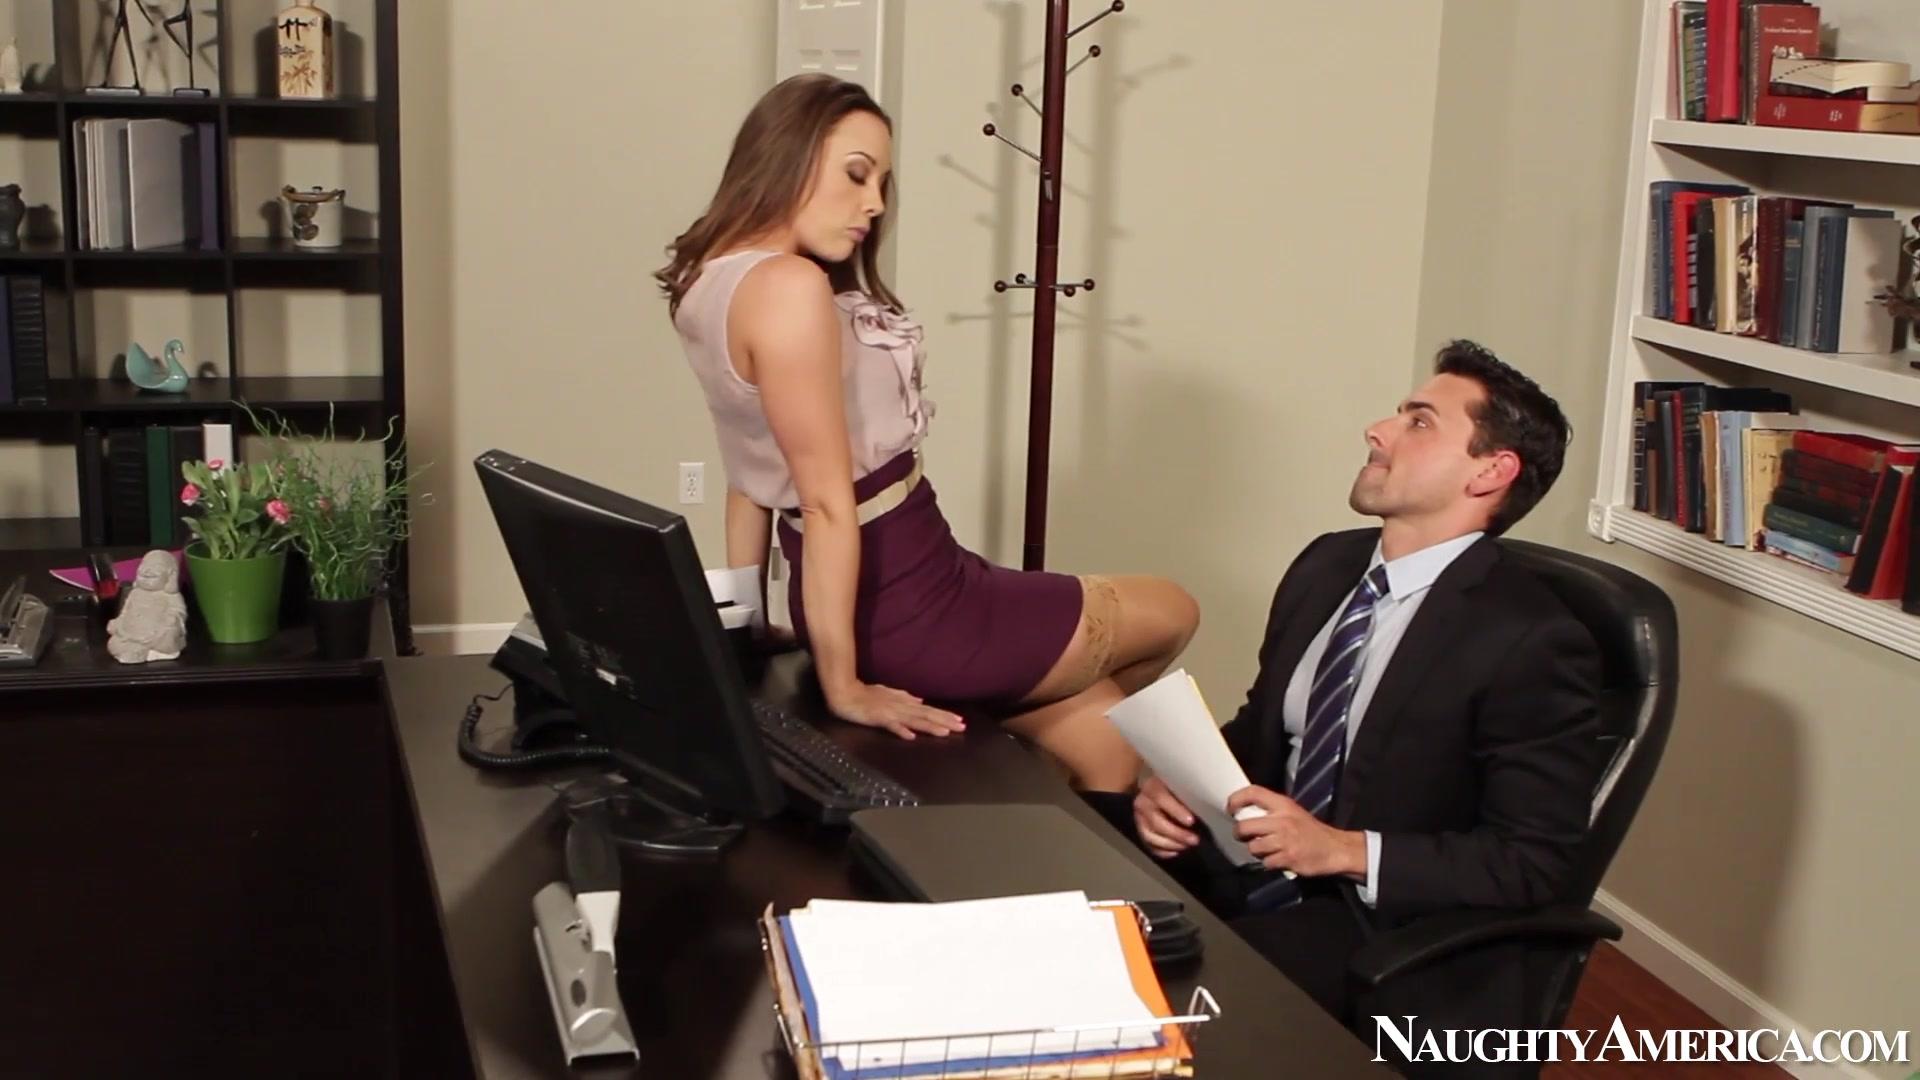 секретарша раздвинула ножки перед шефом фото